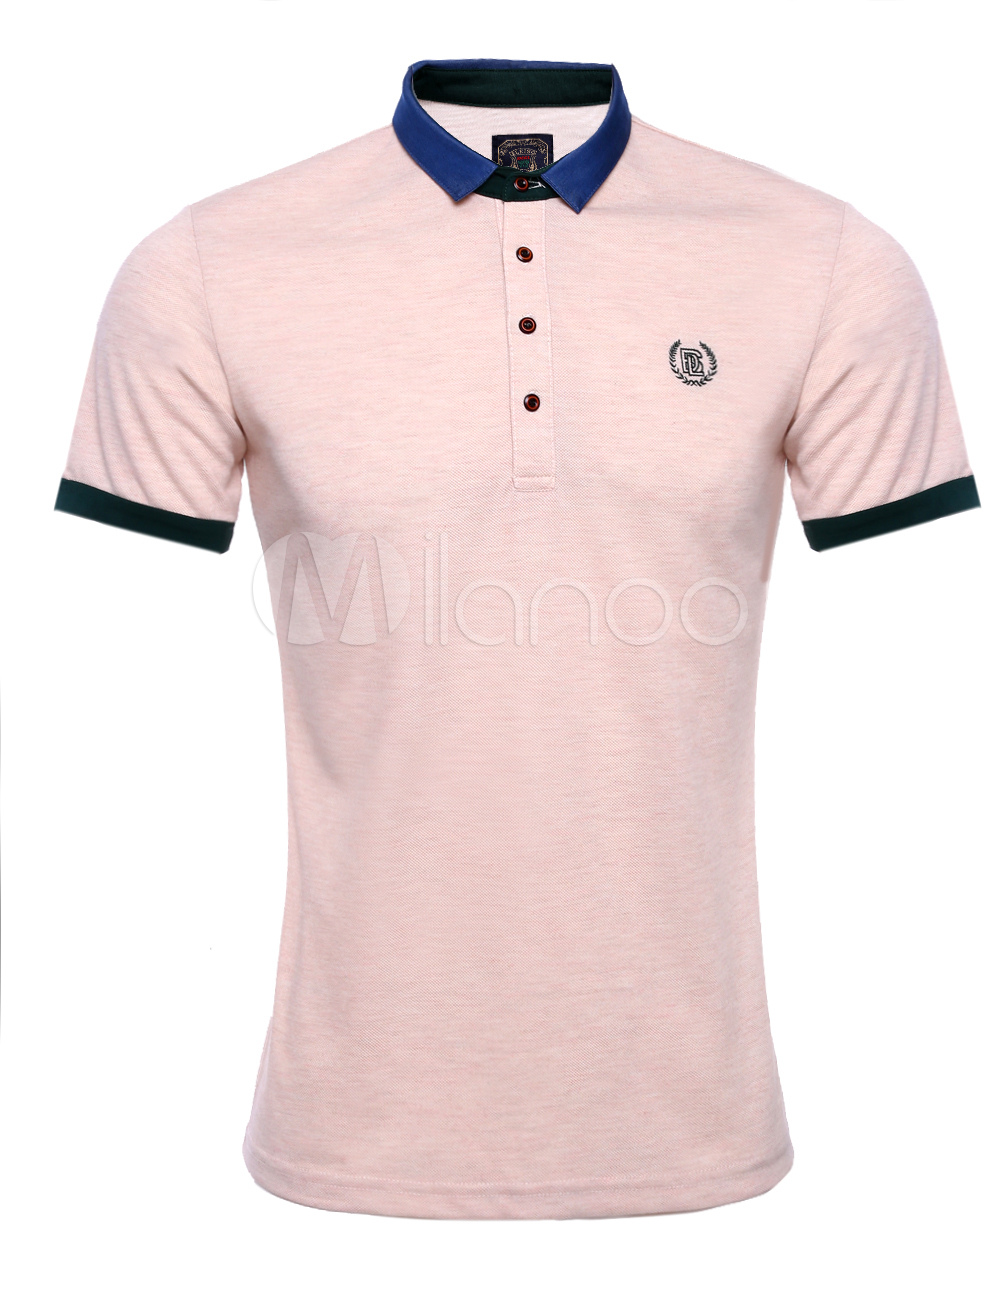 Pink cotton short sleeves logos cool mens polo shirt for Cool mens polo shirts